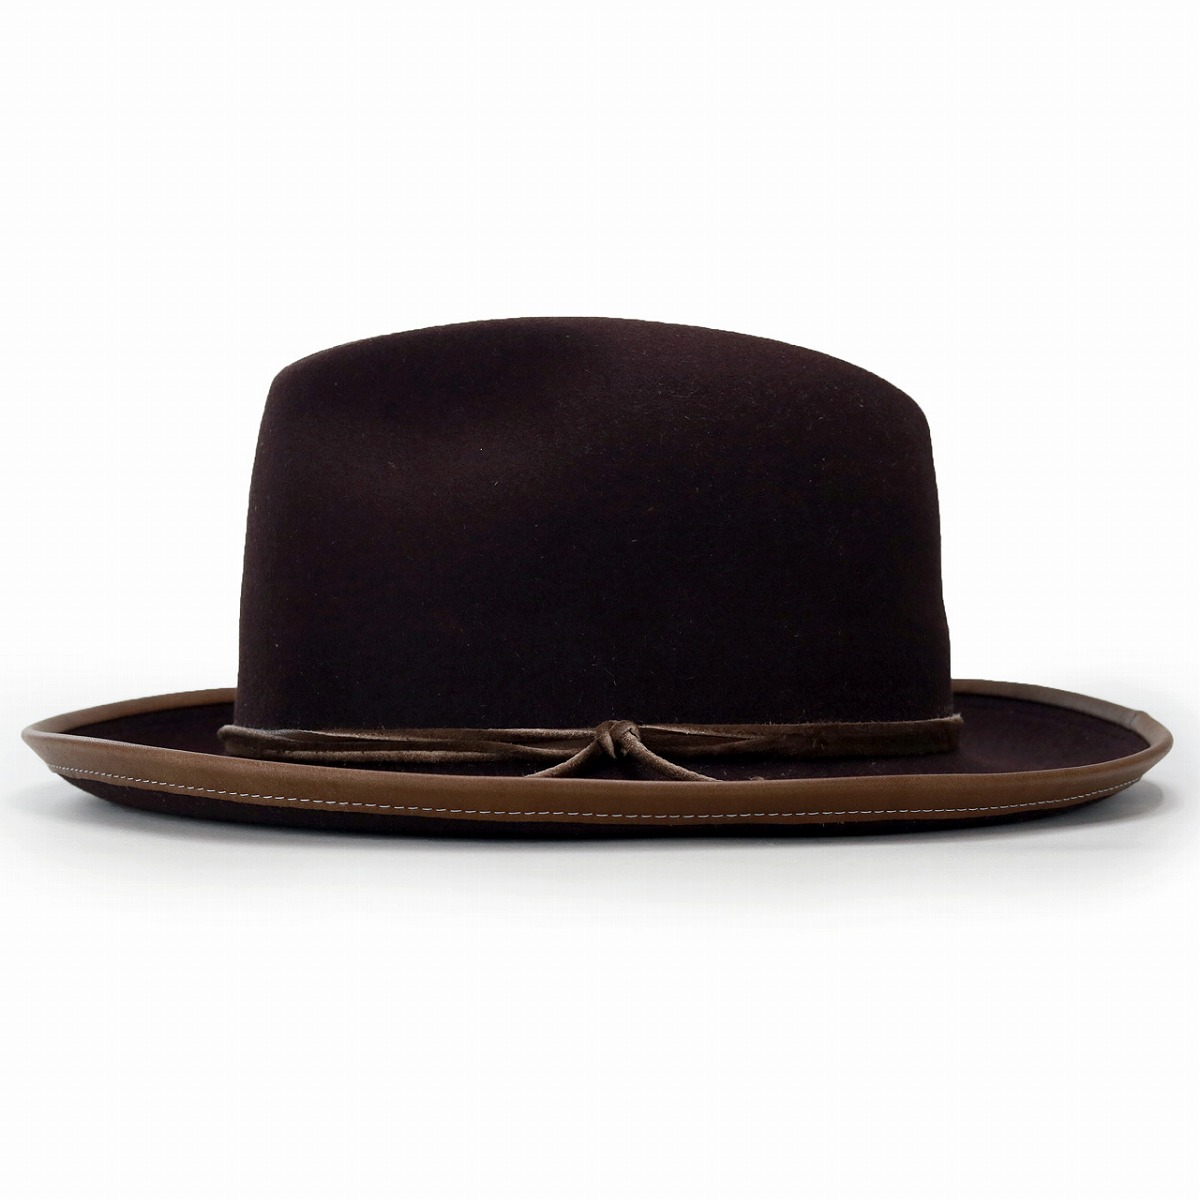 ... The Stetson broad-brimmed hat men brown tea  wide-brim hat  stetson ... da3a54a318d